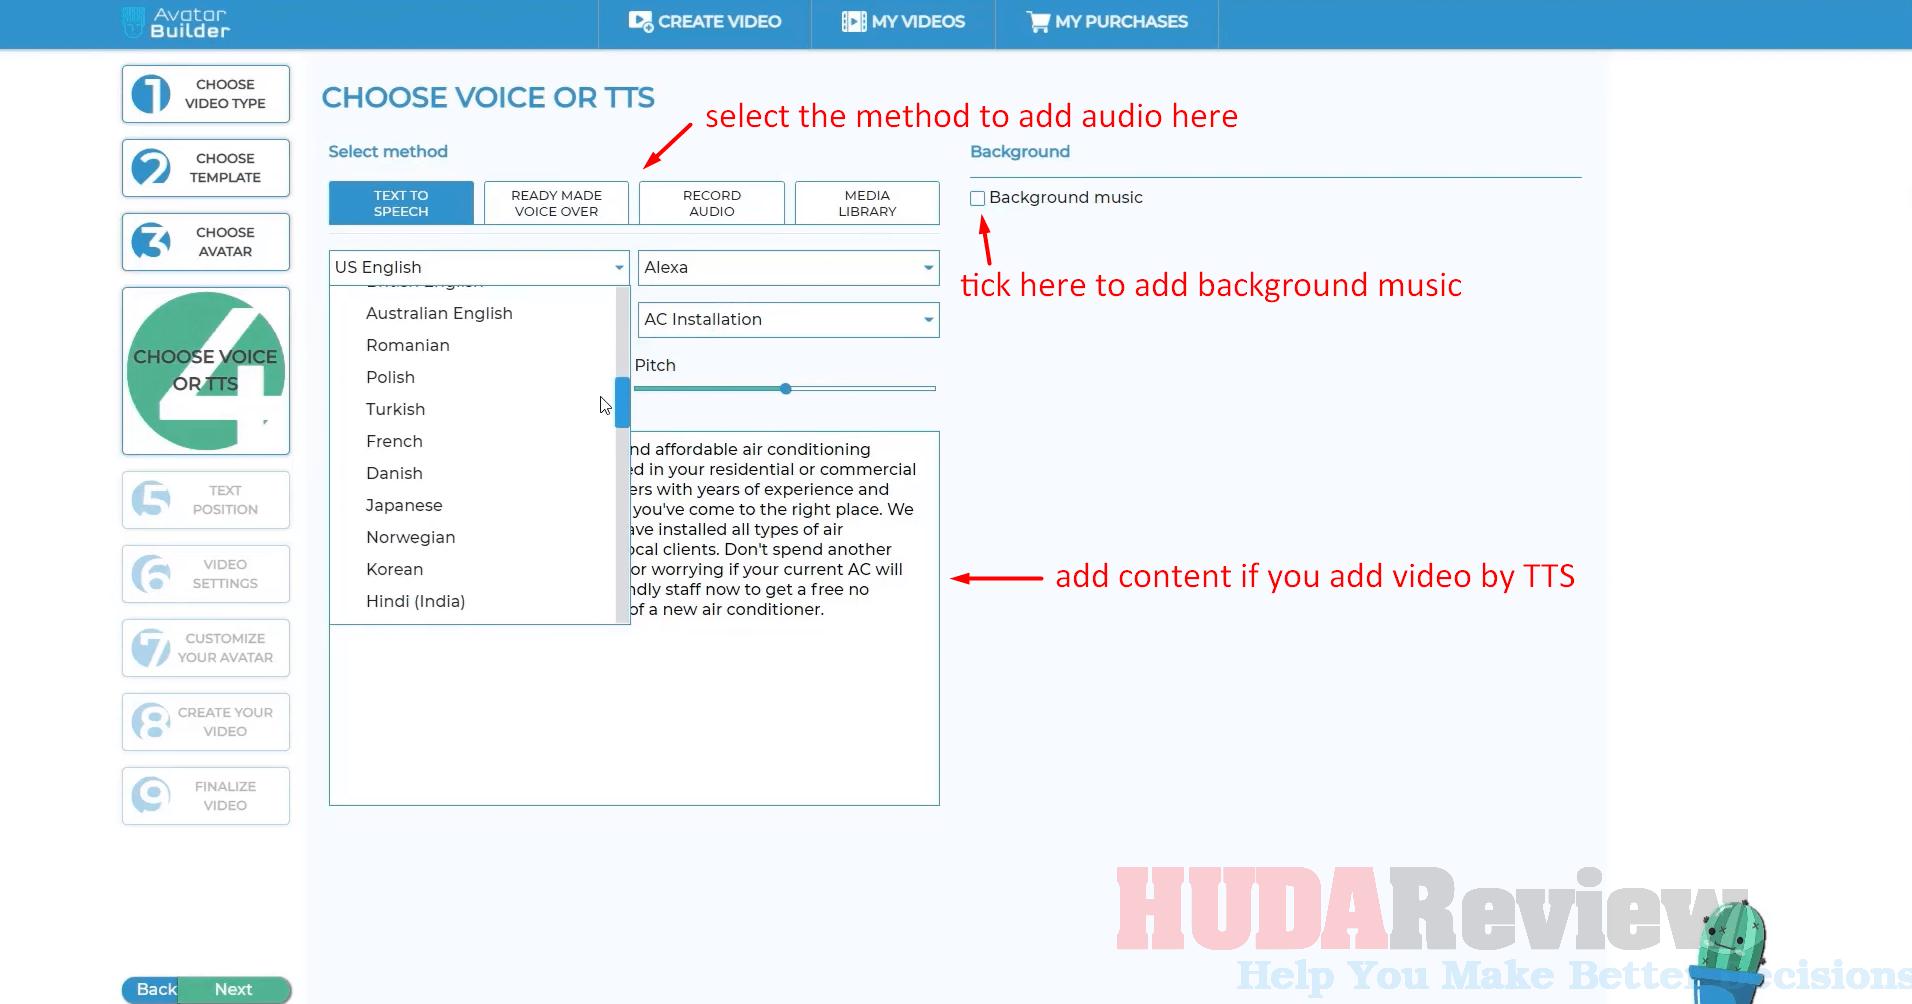 AvatarBuilder-Review-Step-4